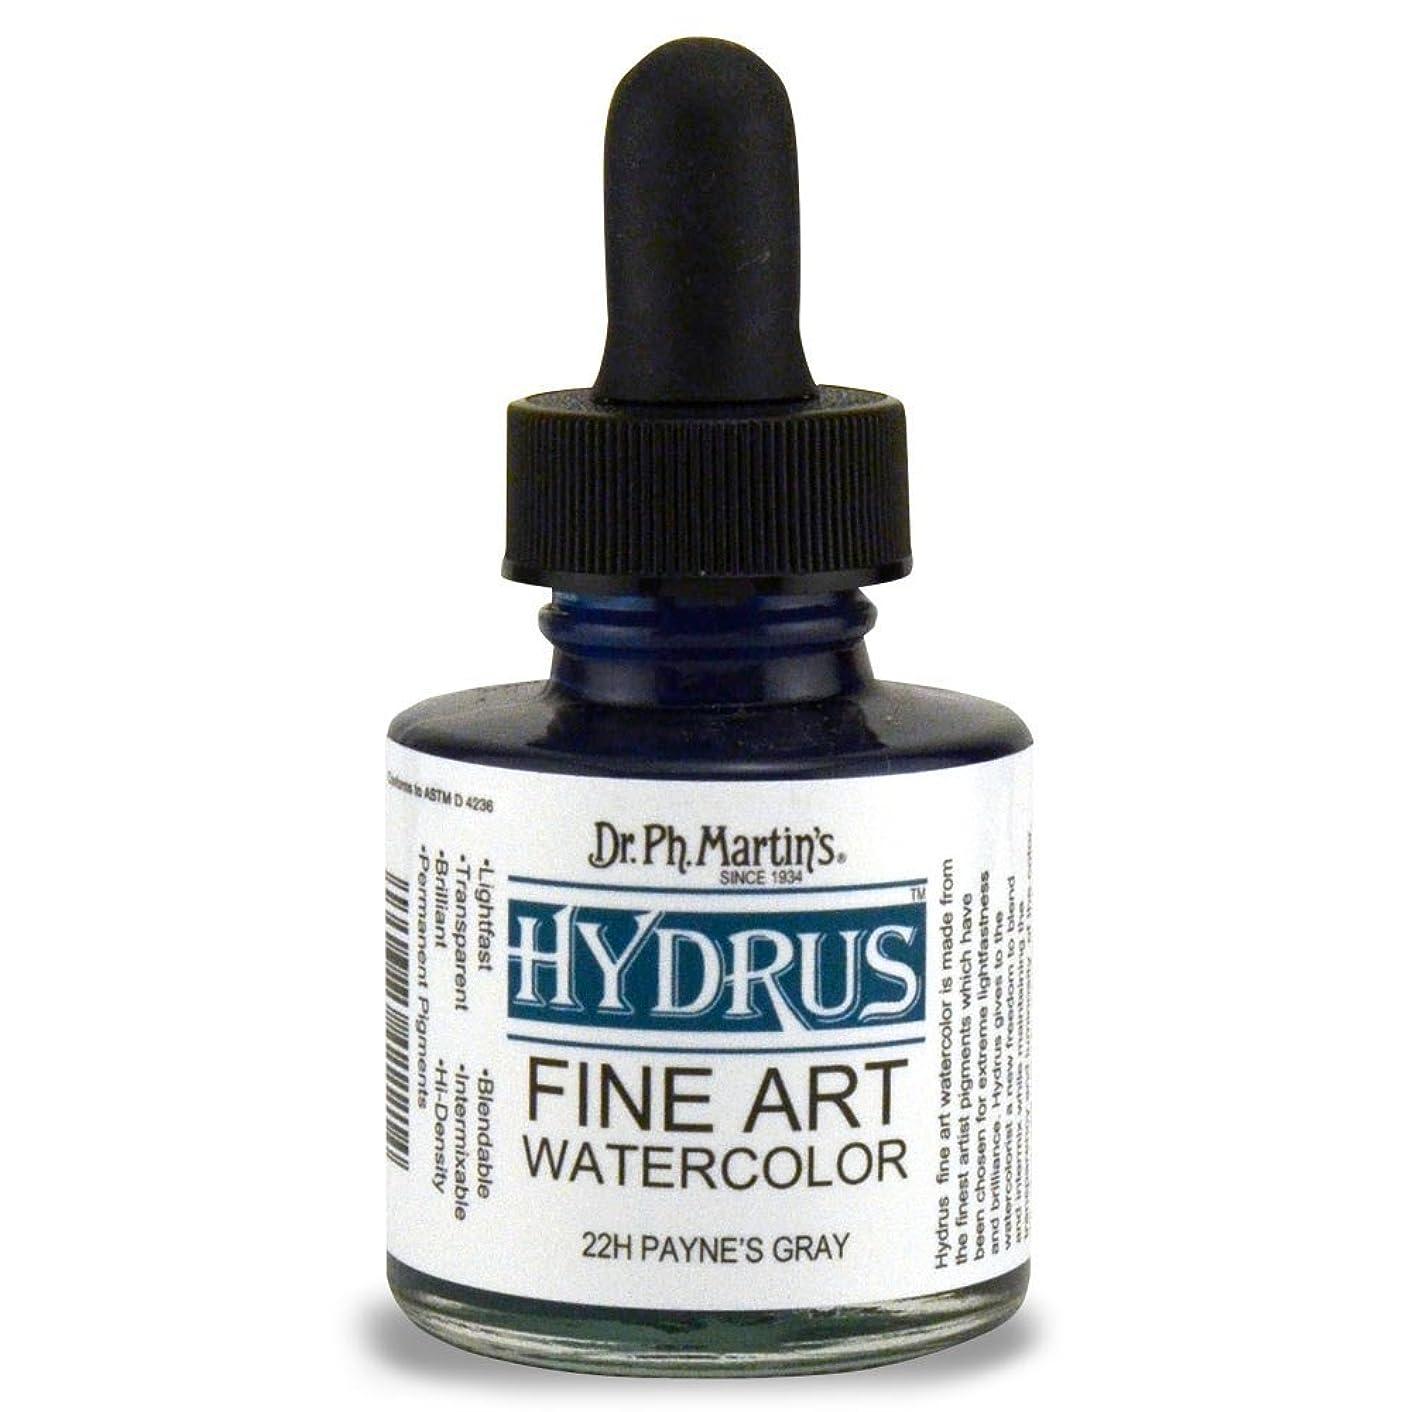 Dr. Ph. Martin's Hydrus Fine Art Watercolor, 1.0 oz, Payne'S Gray (22H)